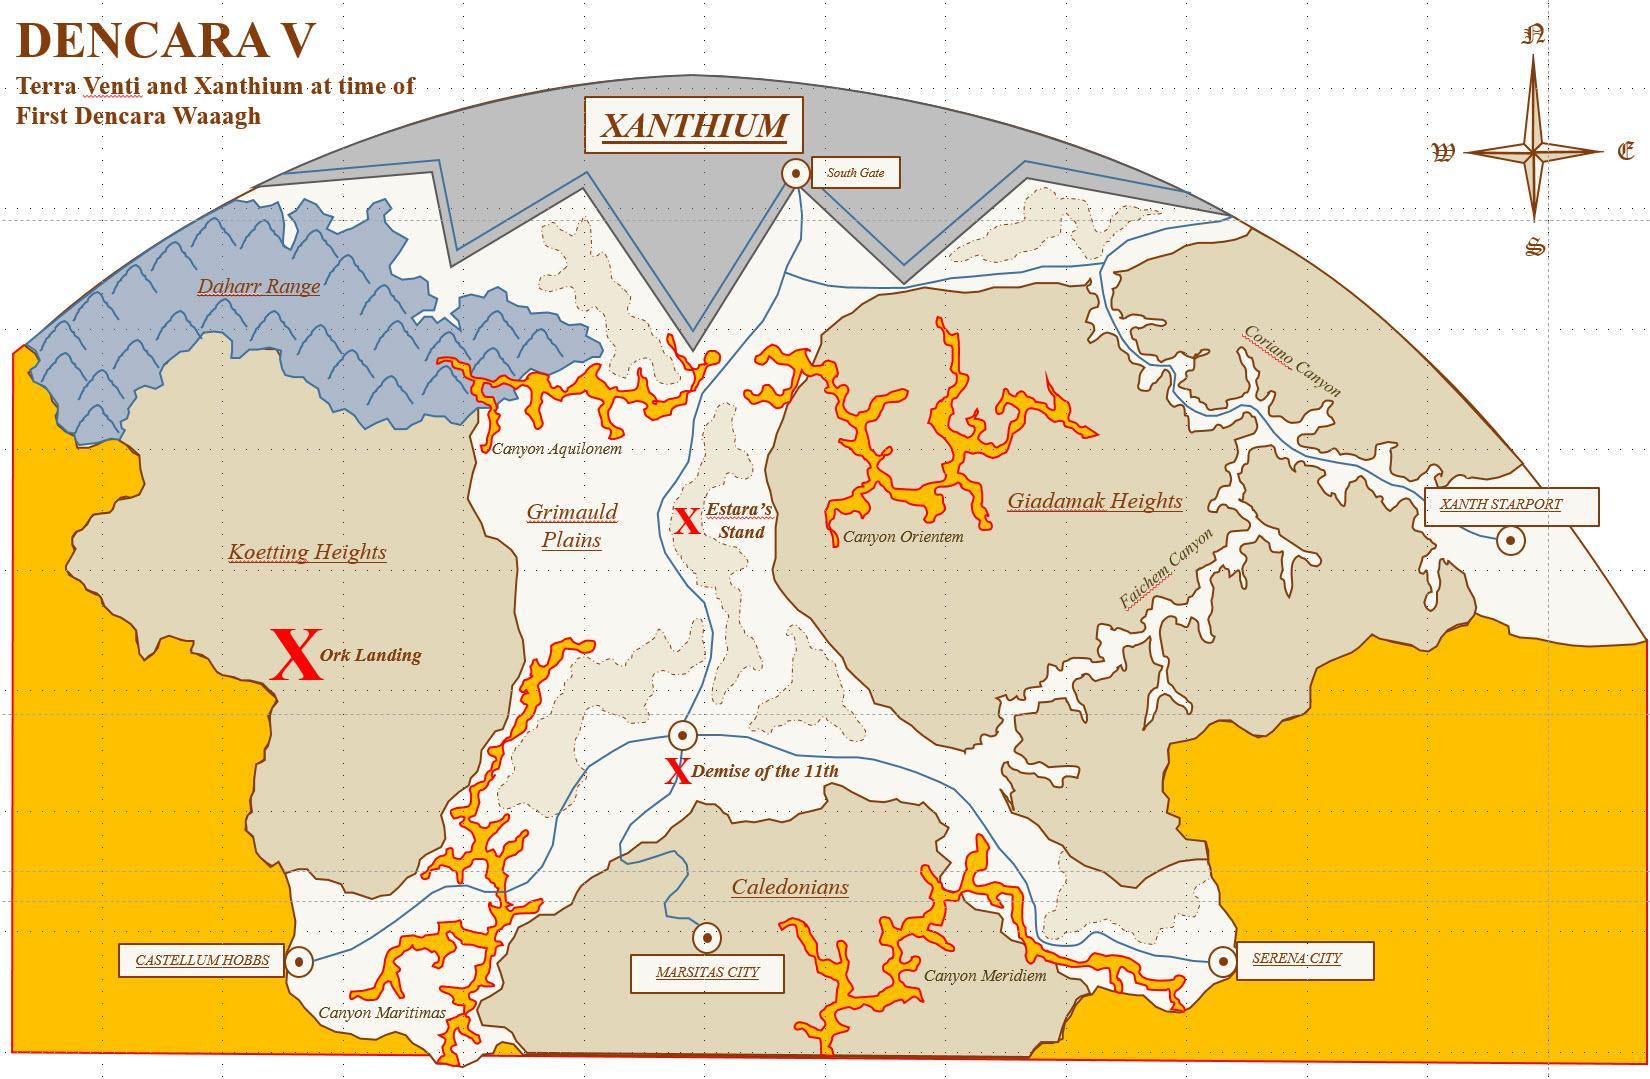 Map of hnorthern Dencara